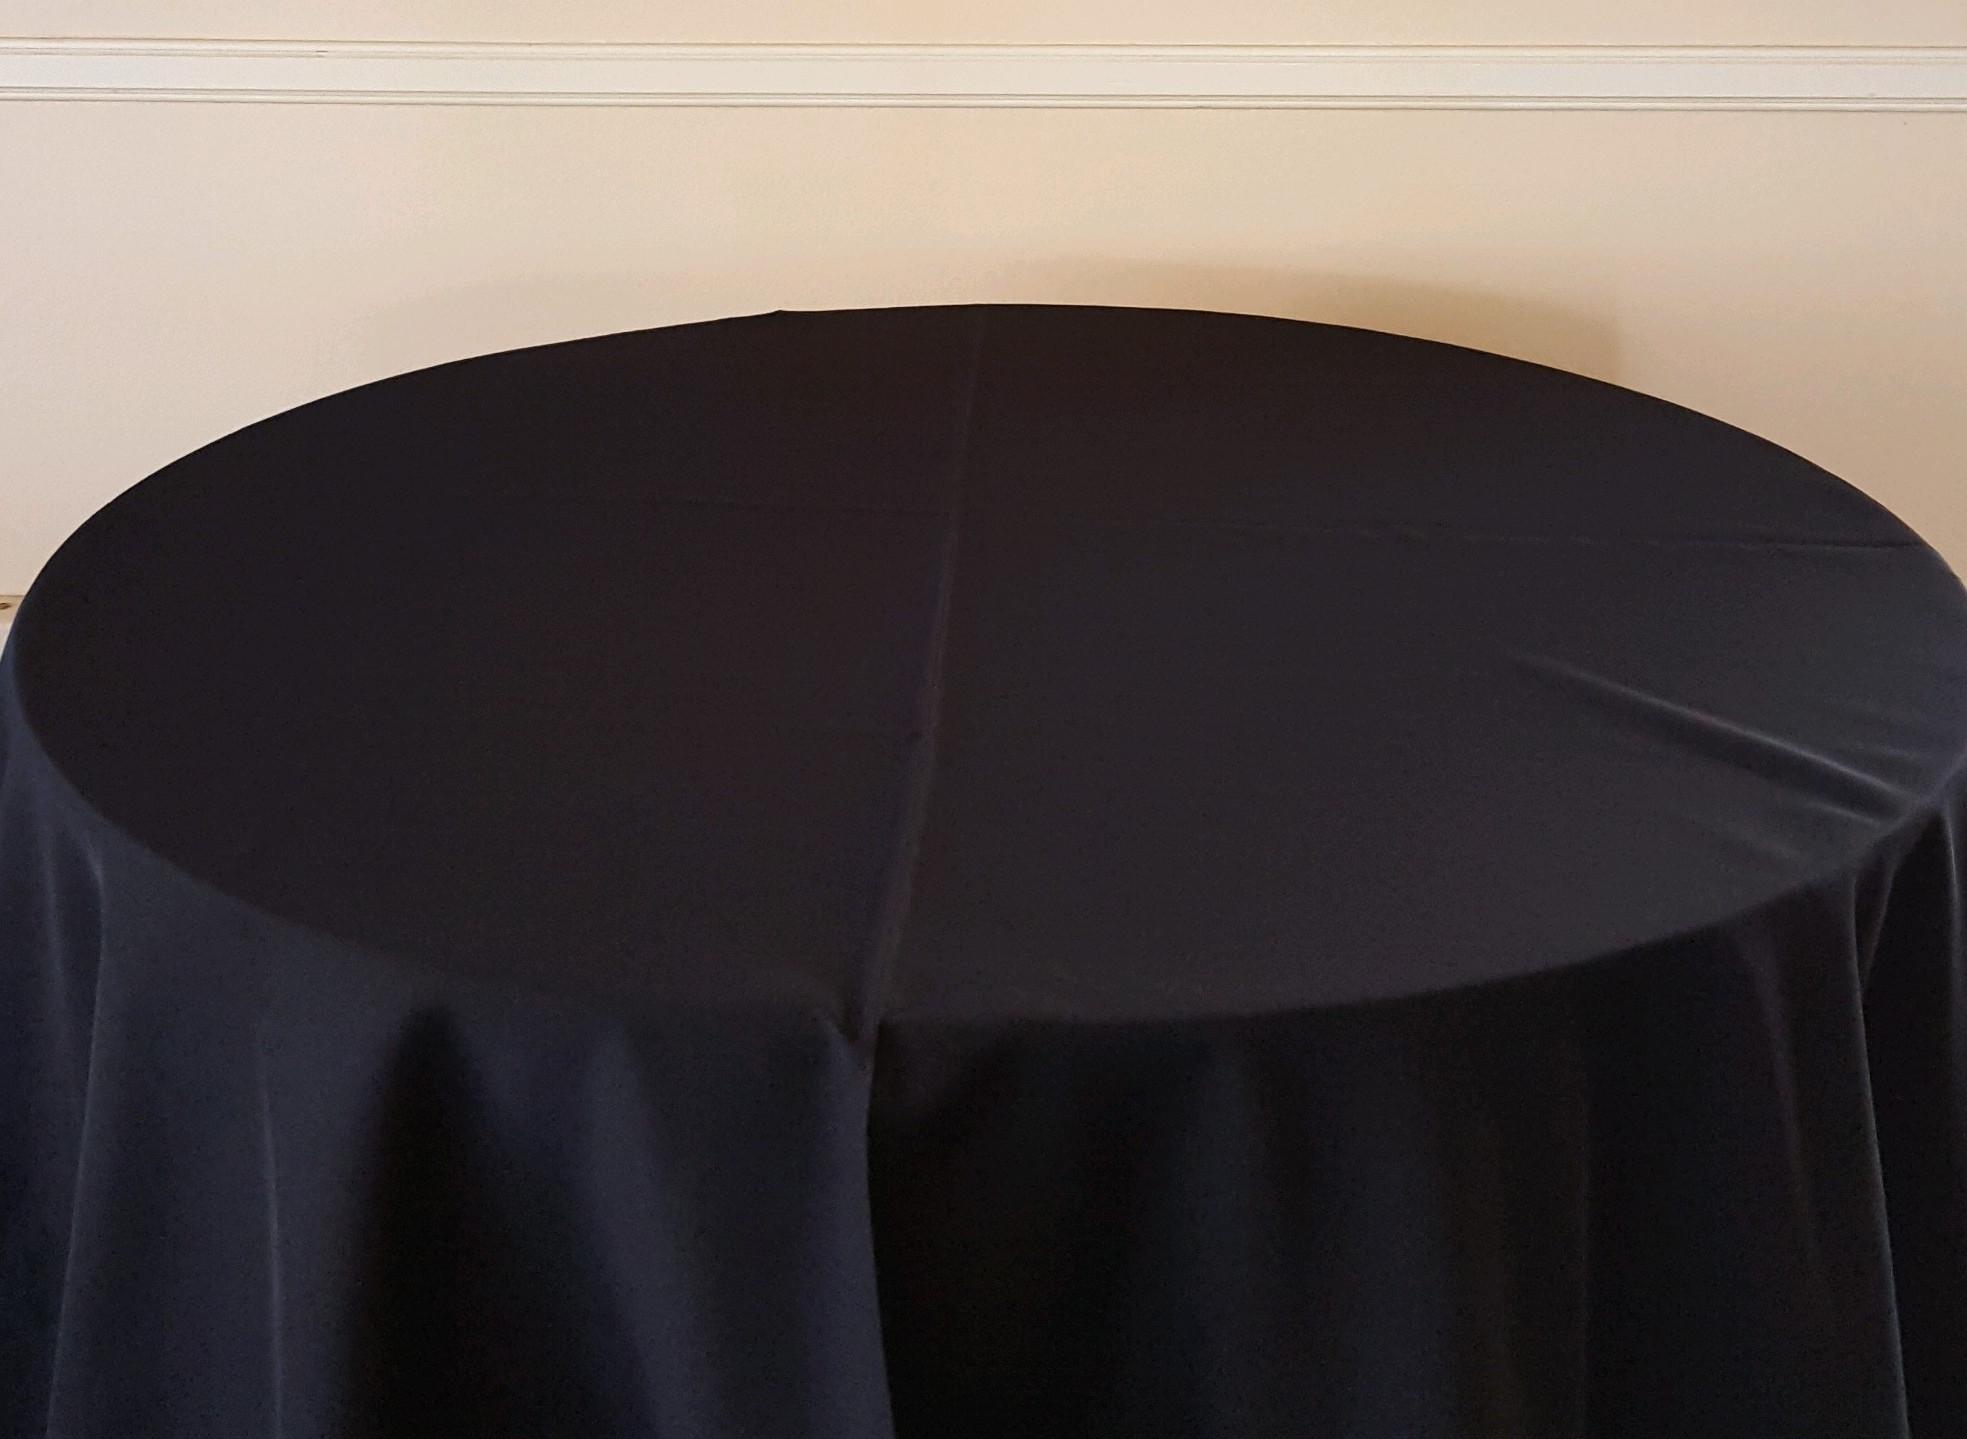 "Black - 130"" drape, 120"" drape, 108"" drape, 90"" drape, 6' banquet, 8' banquet & napkins"